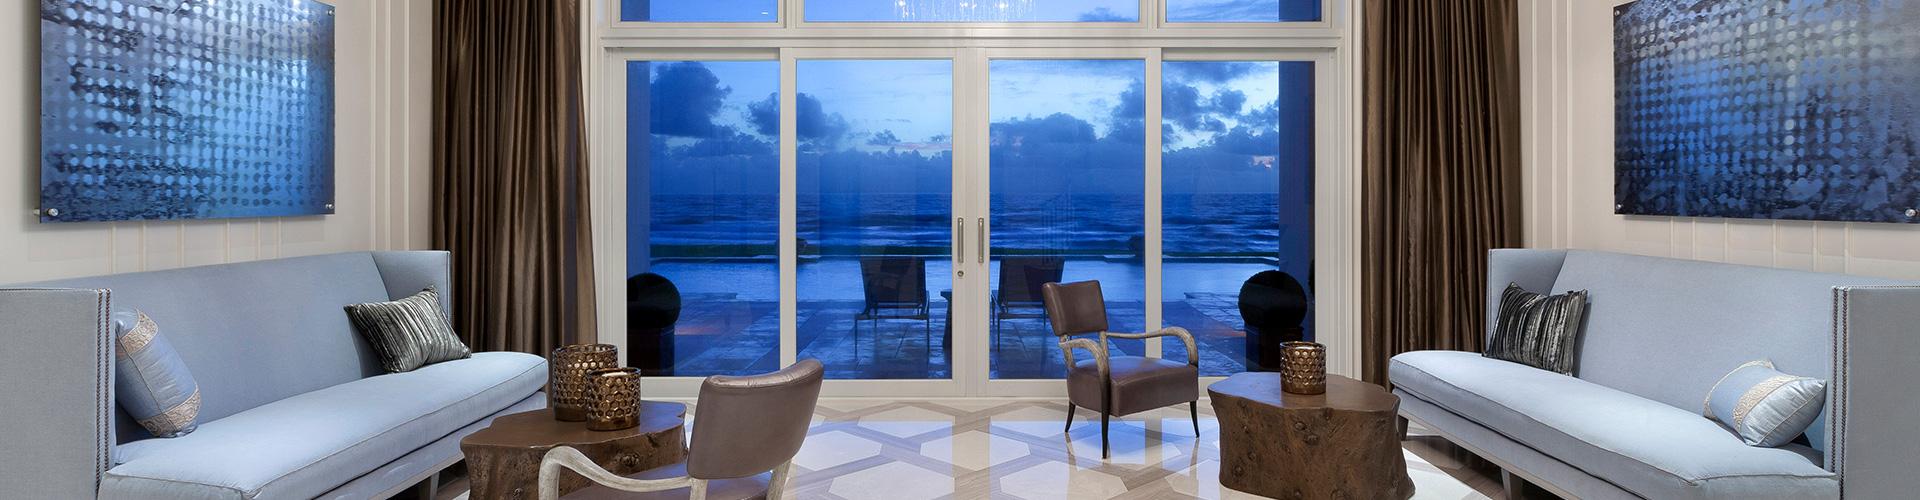 Home impact windows company